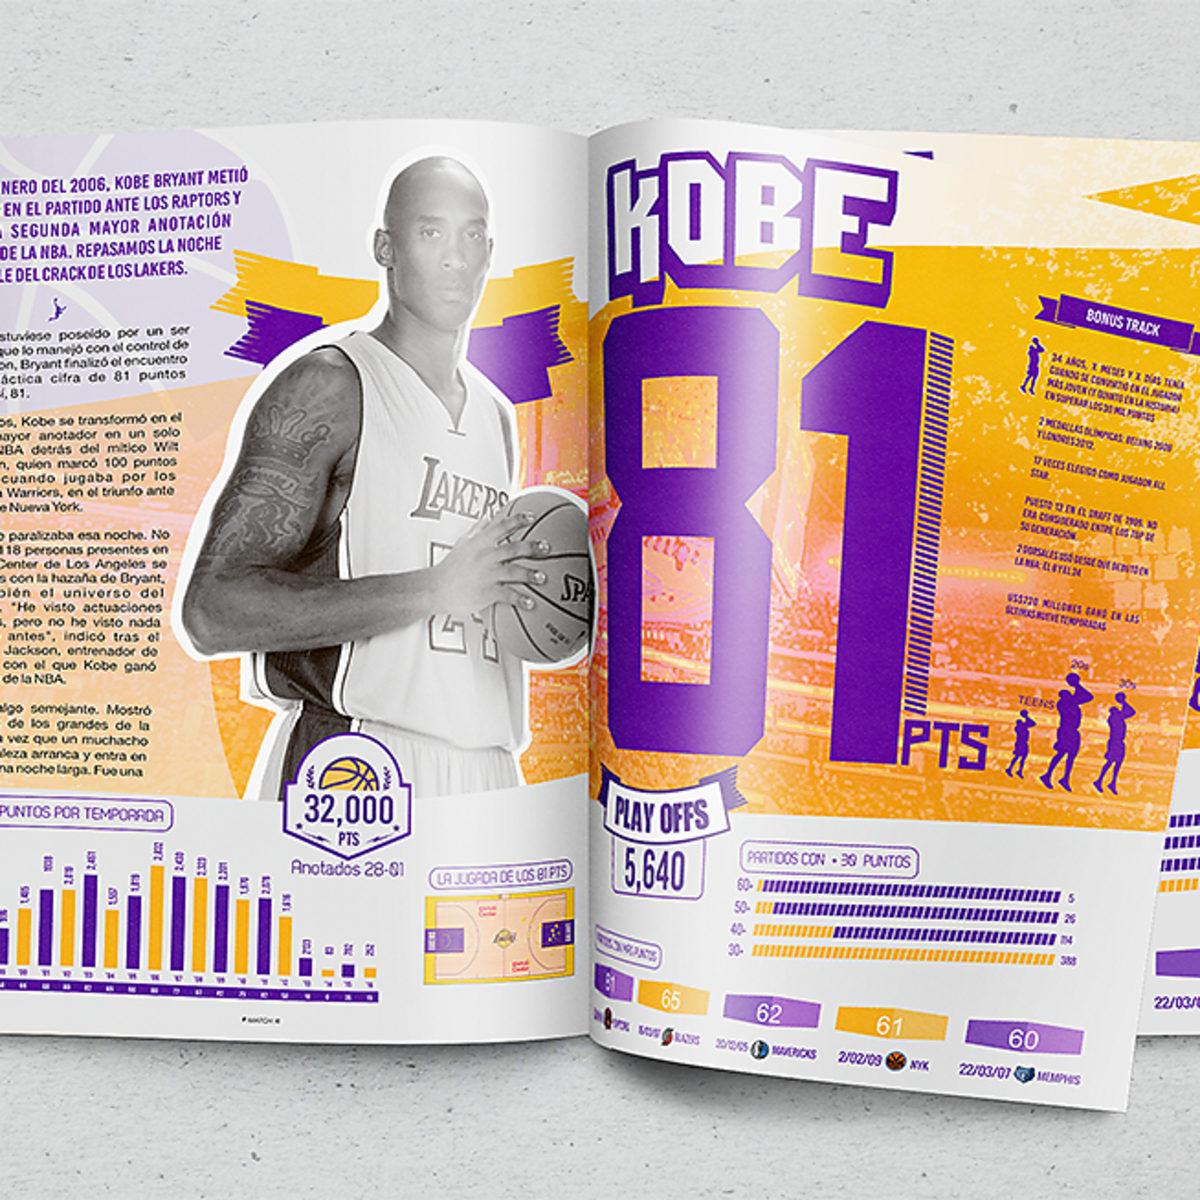 infografia kobe bryant Buscar con Google | Kobe, Kobe